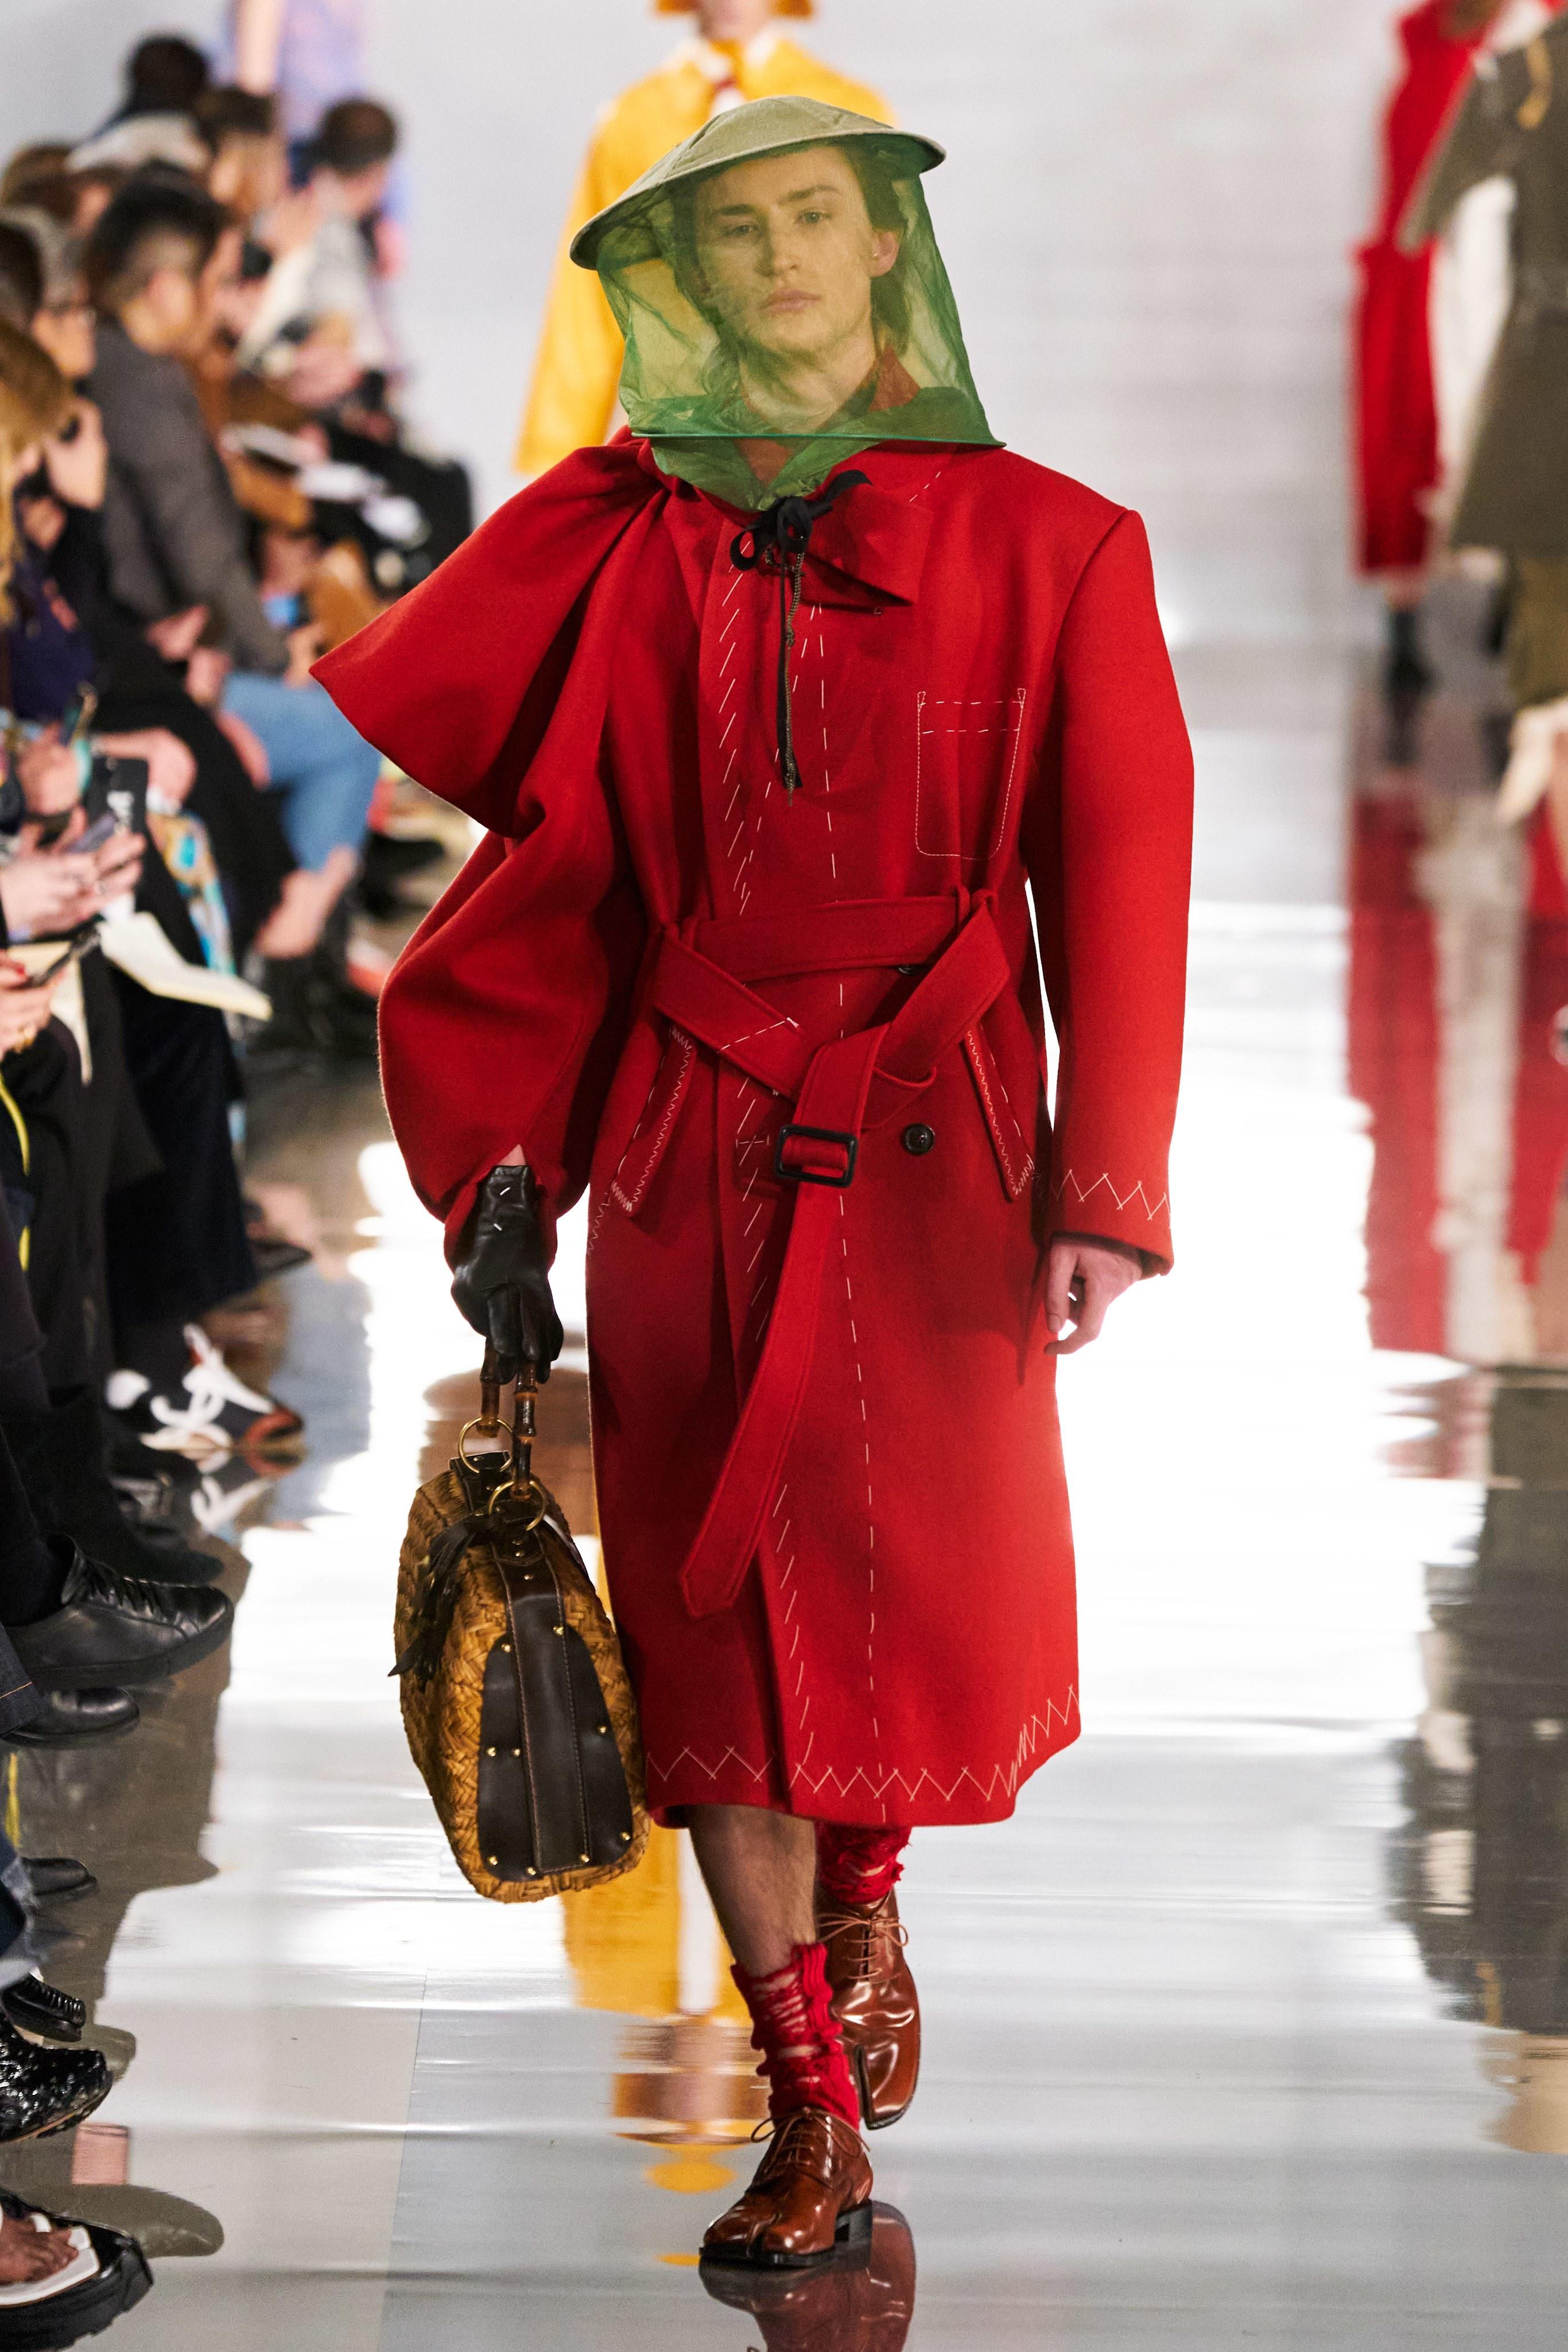 fashion shows fall 2020 ready to wear maison Martin margiela